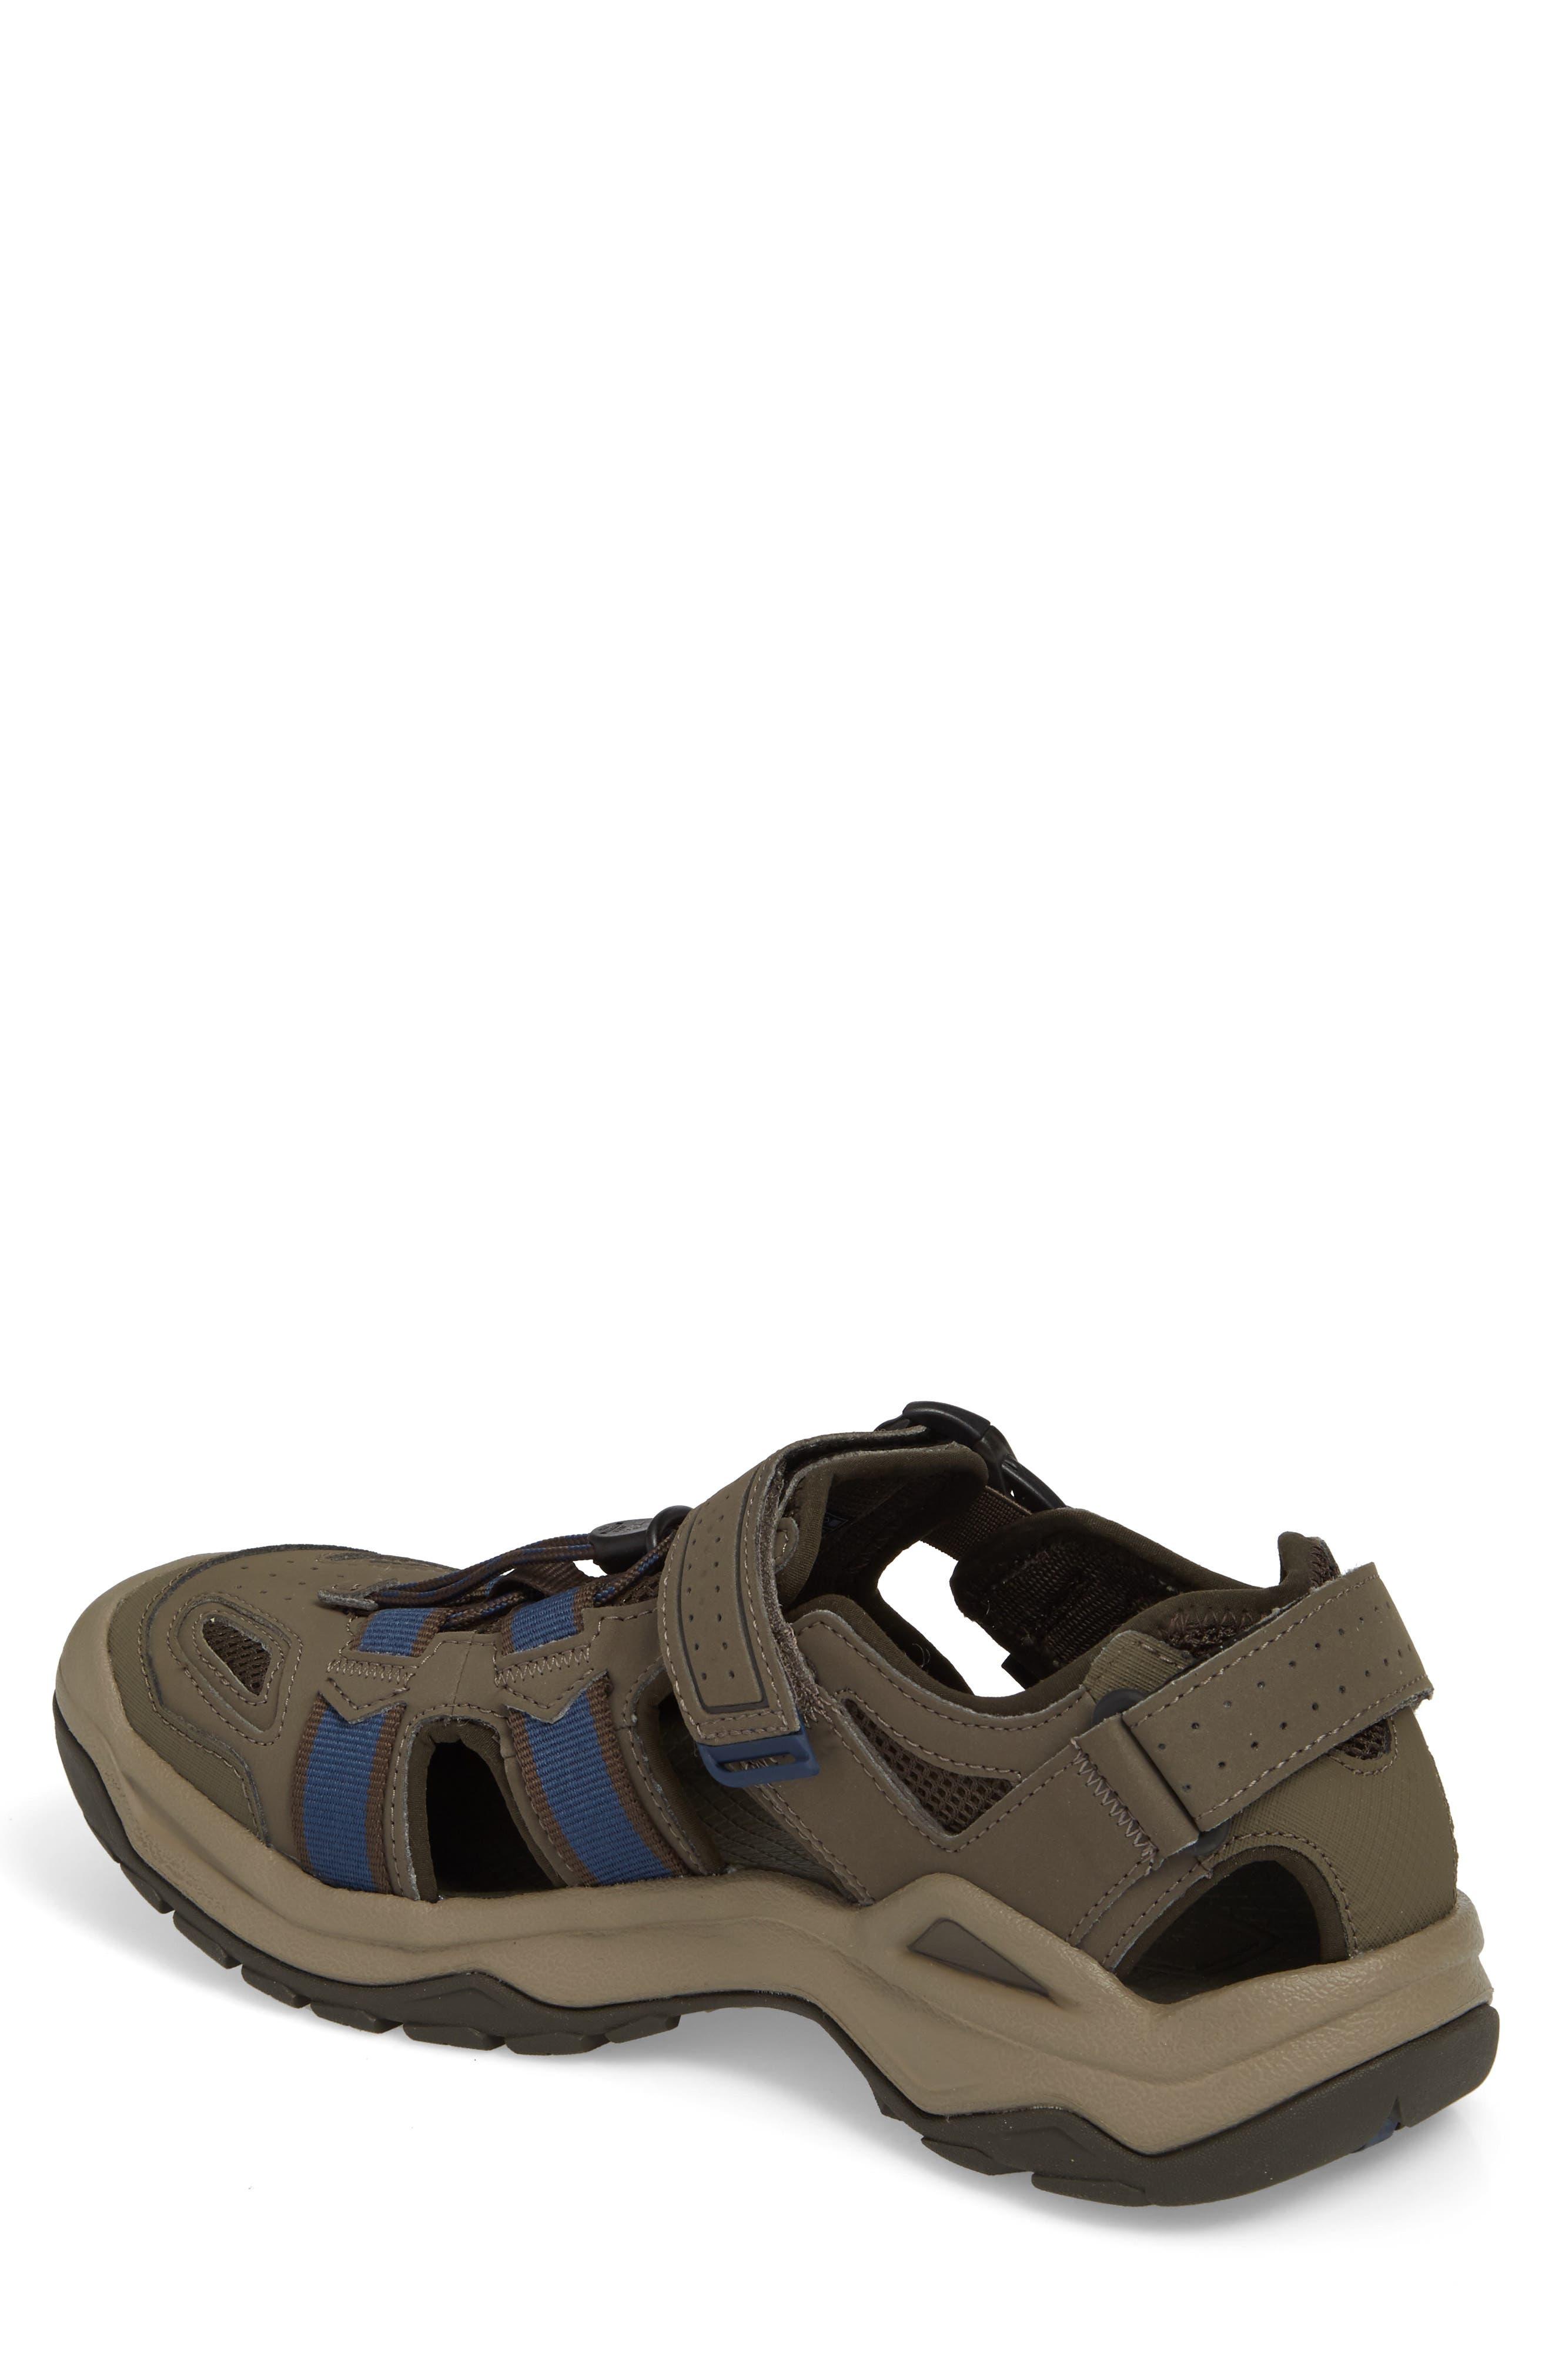 Omnium 2 Hiking Sandal,                             Alternate thumbnail 2, color,                             BROWN NYLON